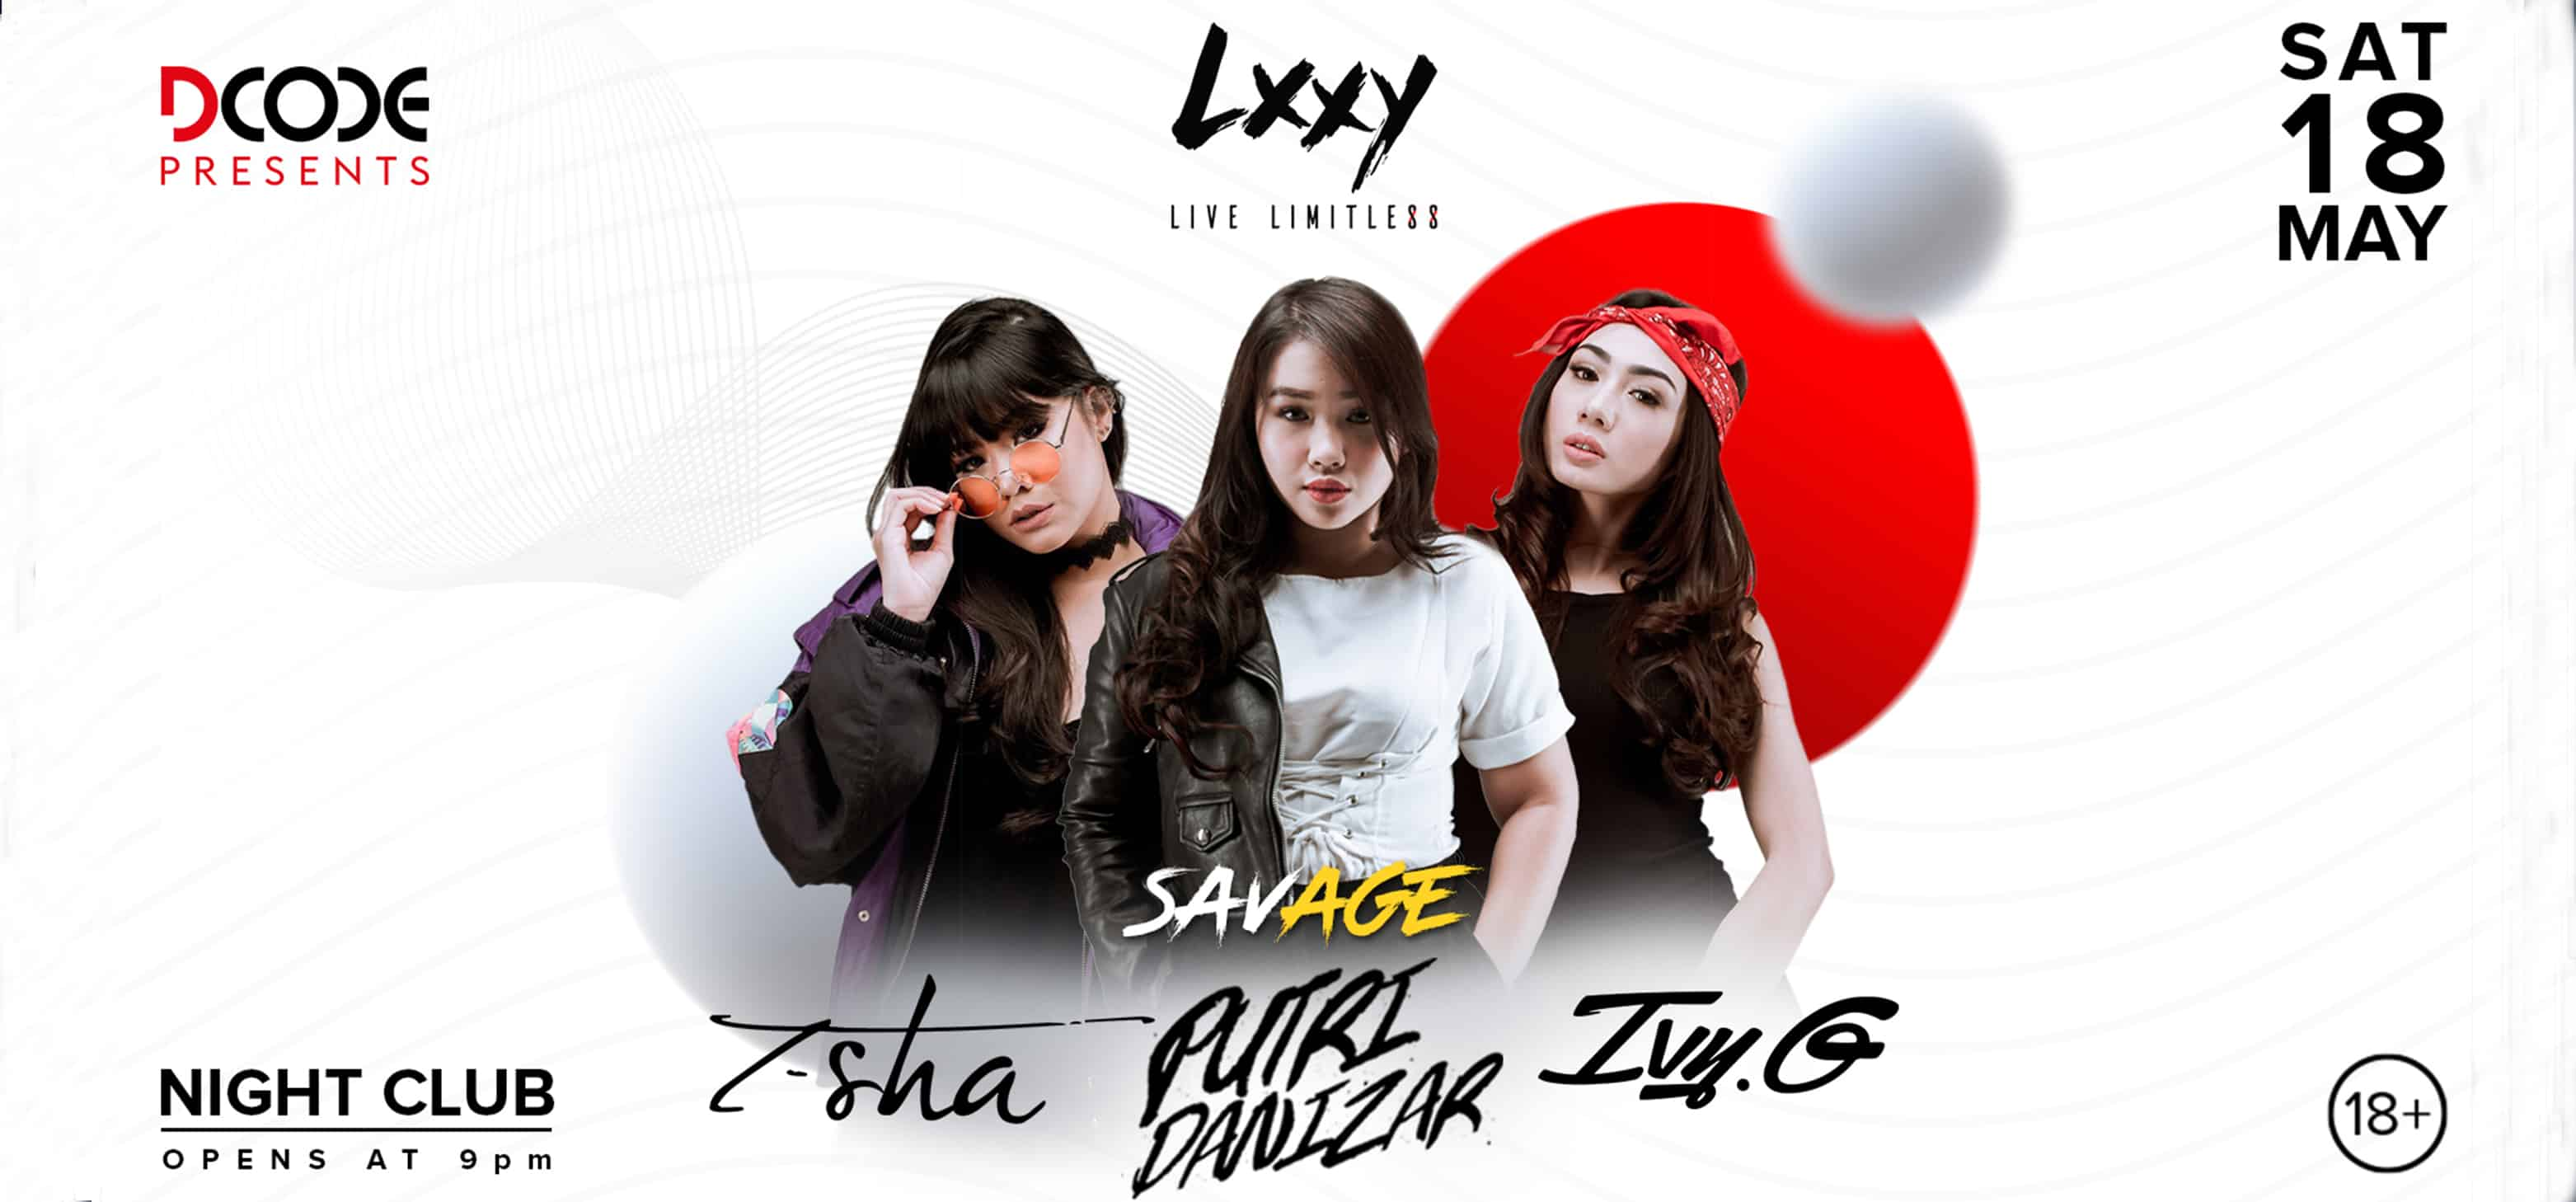 LXXY #SAVAGE